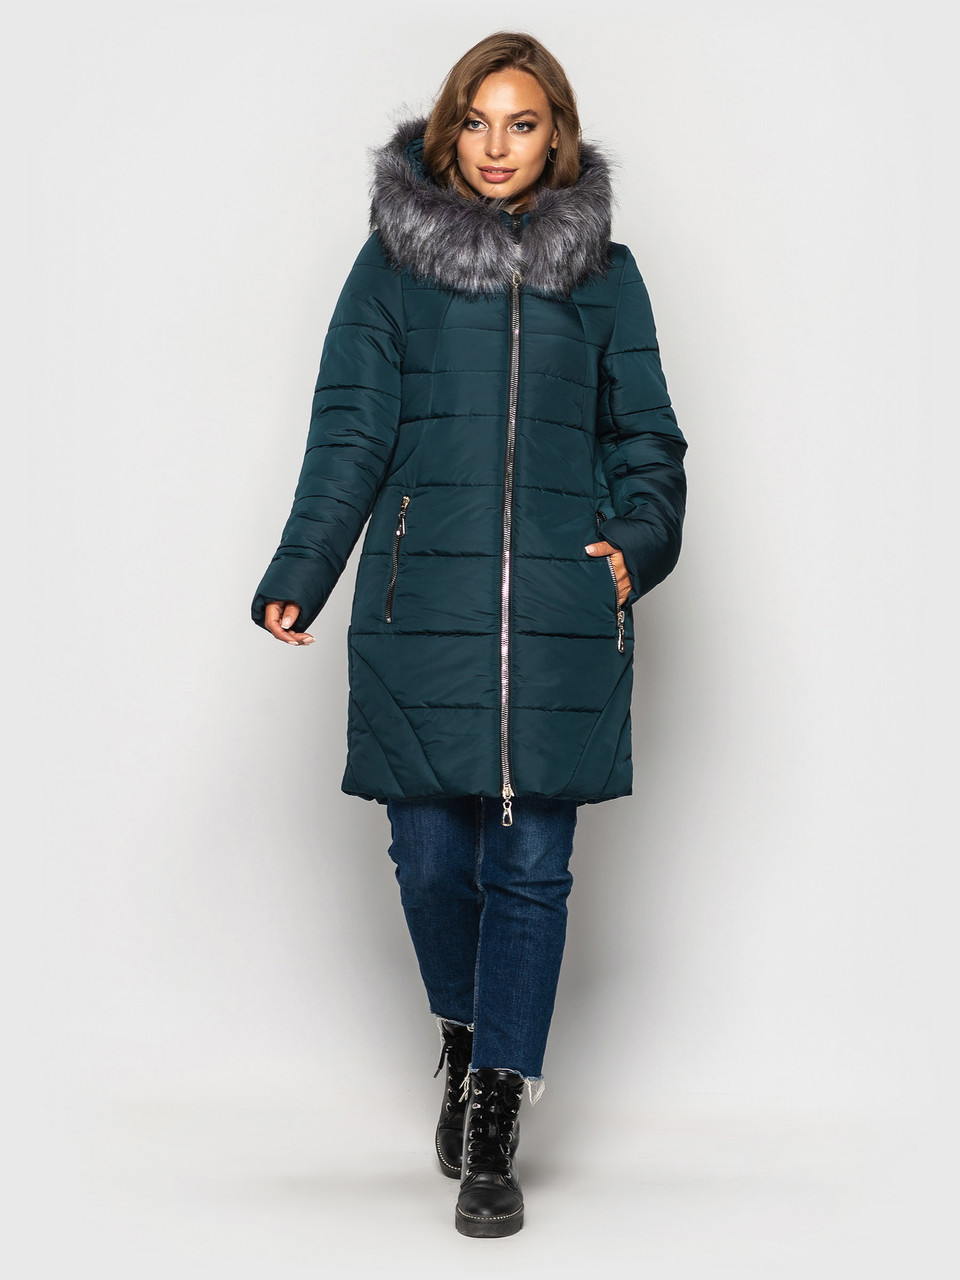 Куртка парка зимняя 77 ( 4 расцветки)